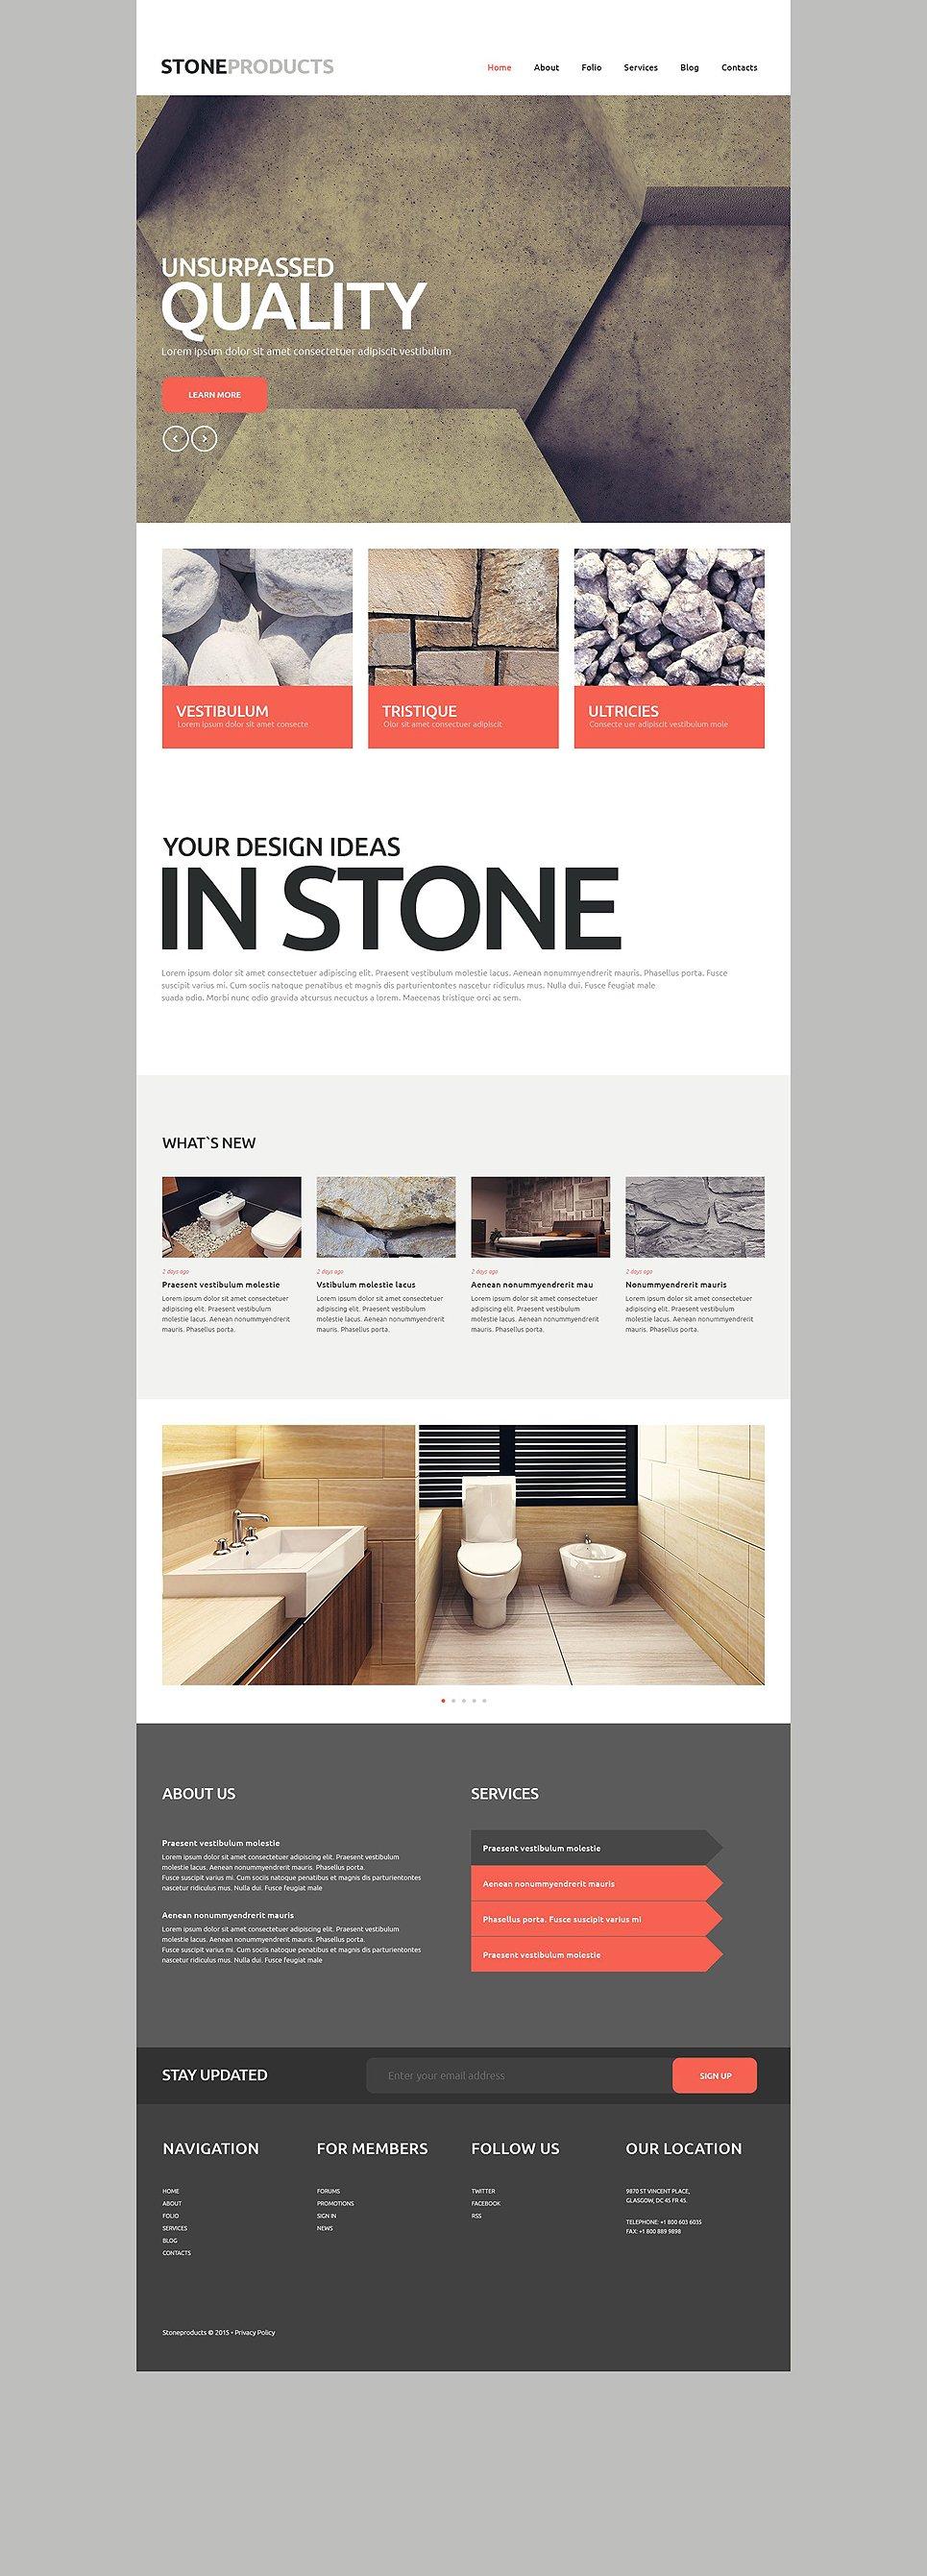 flooring materials website template. Black Bedroom Furniture Sets. Home Design Ideas